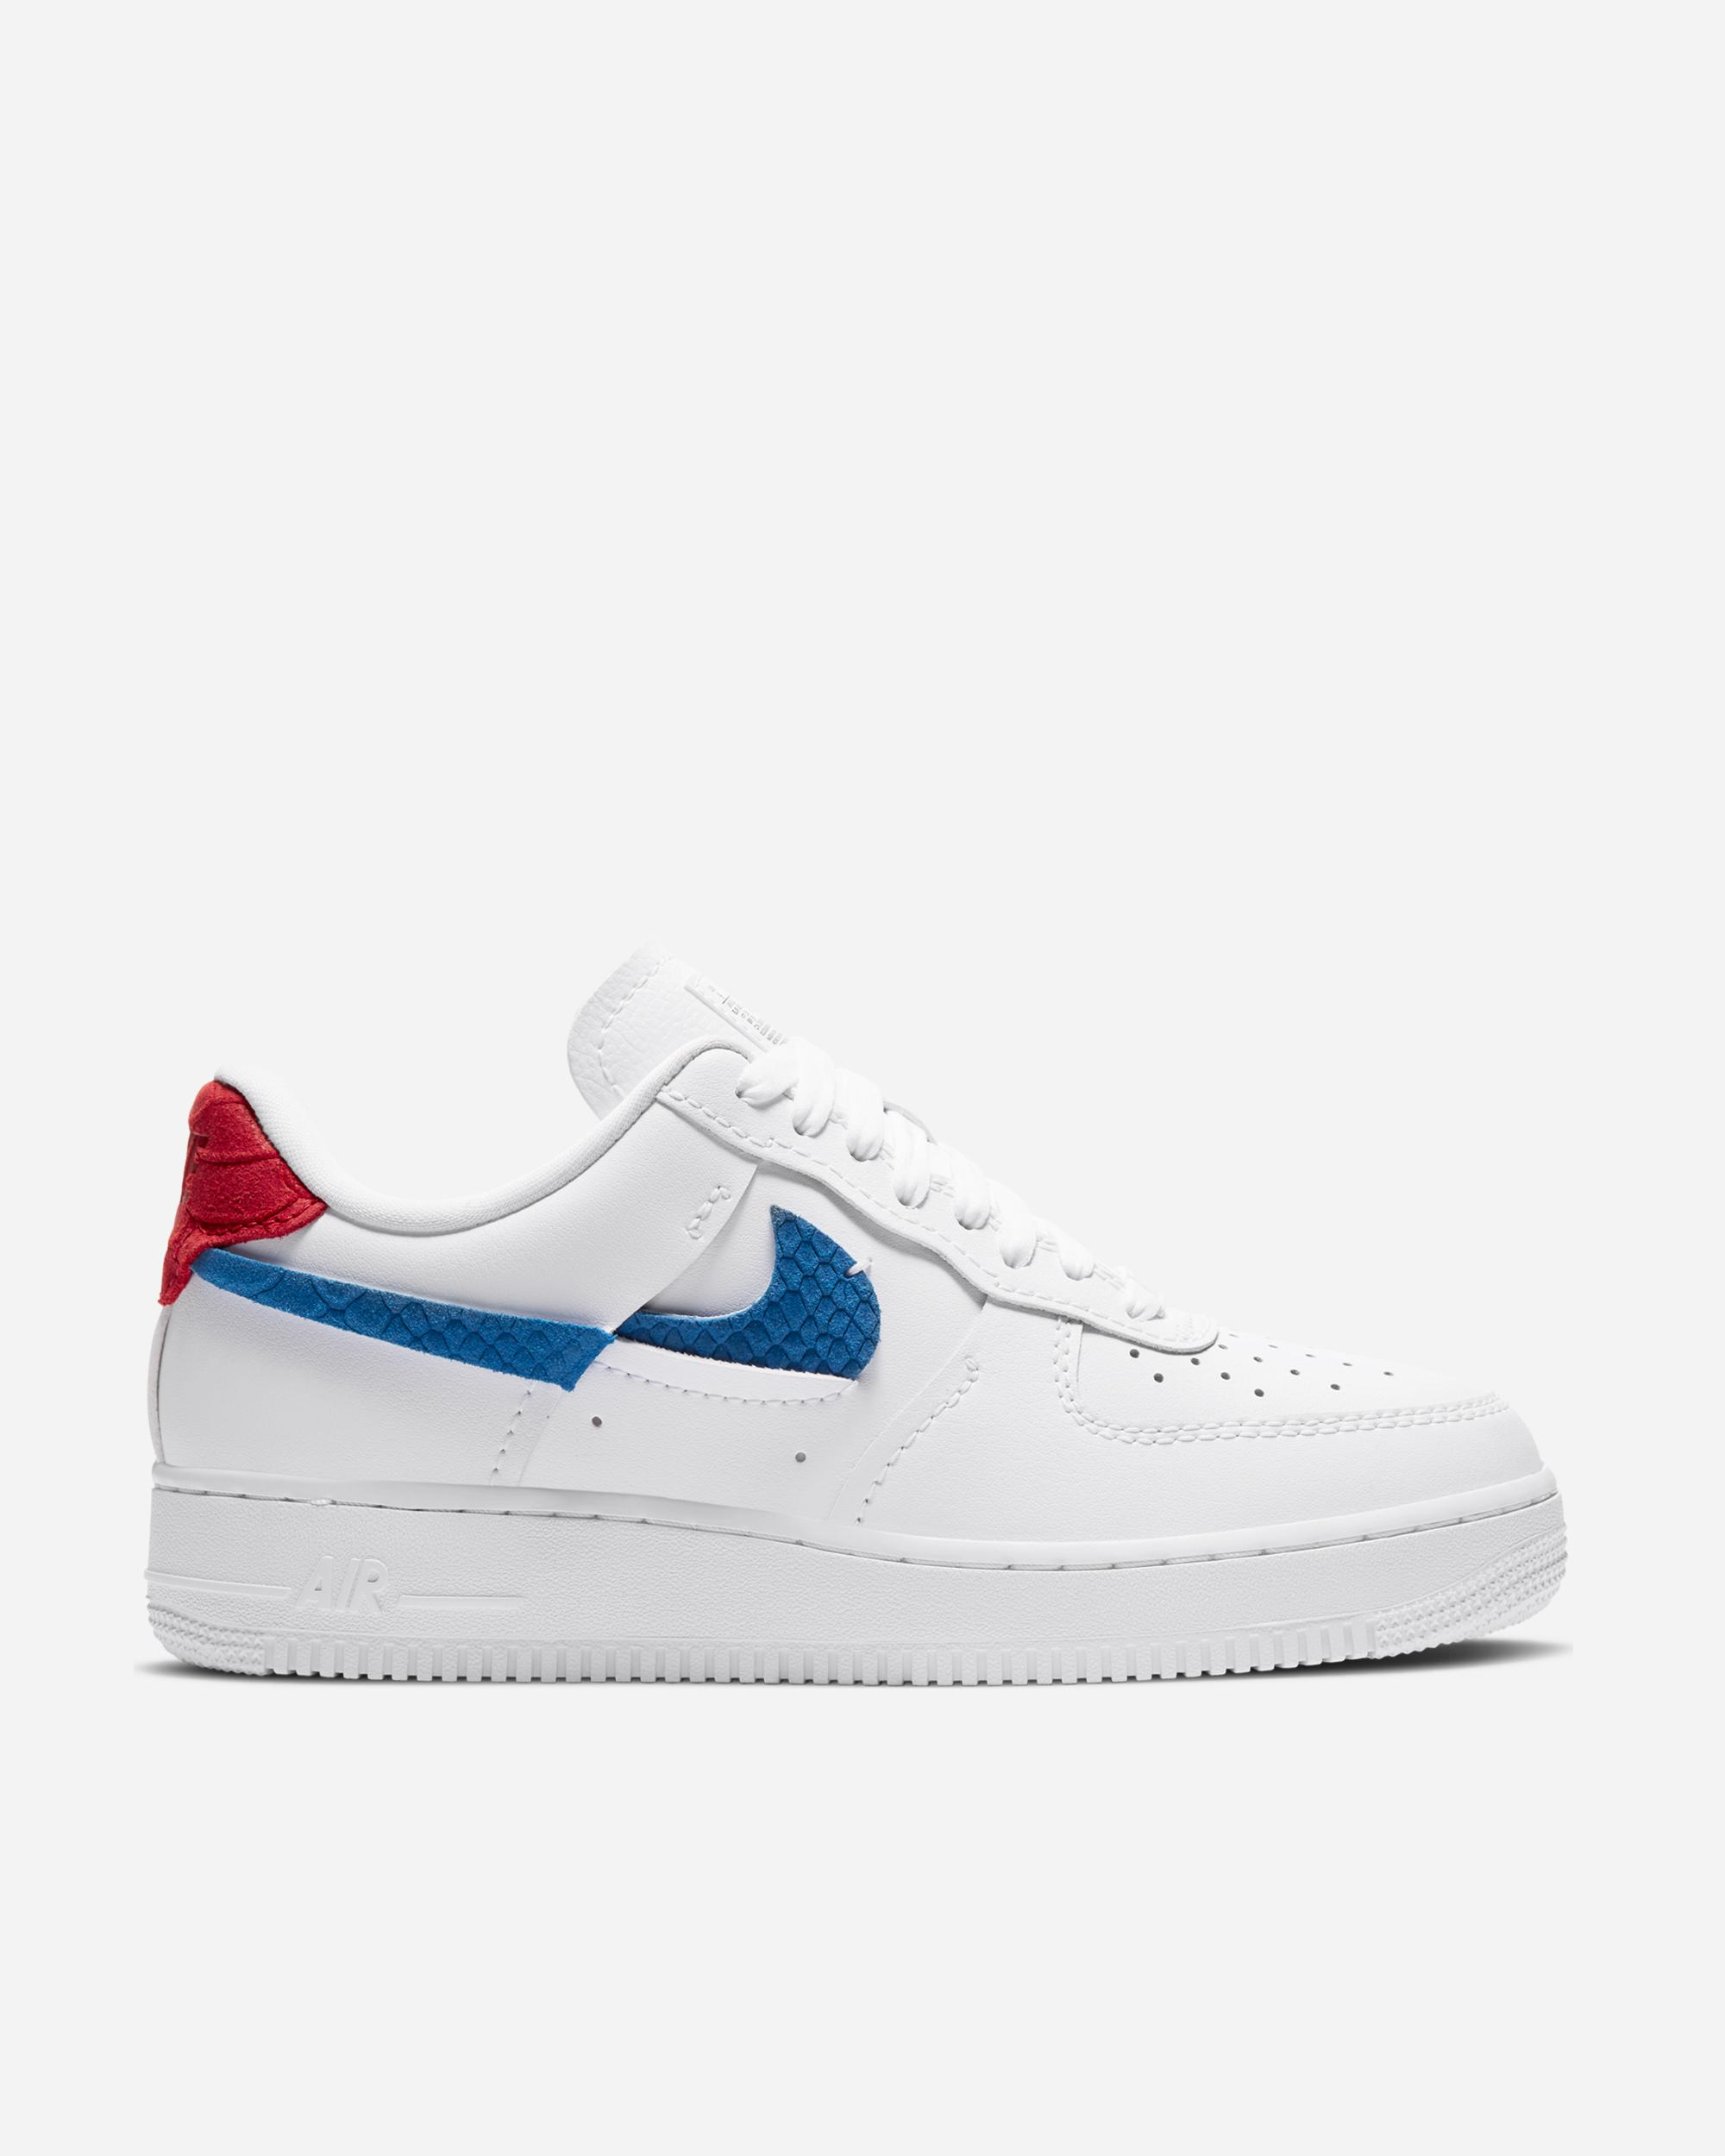 Nike Sportswear Air Force 1 LXX White/Royal/University Red ...